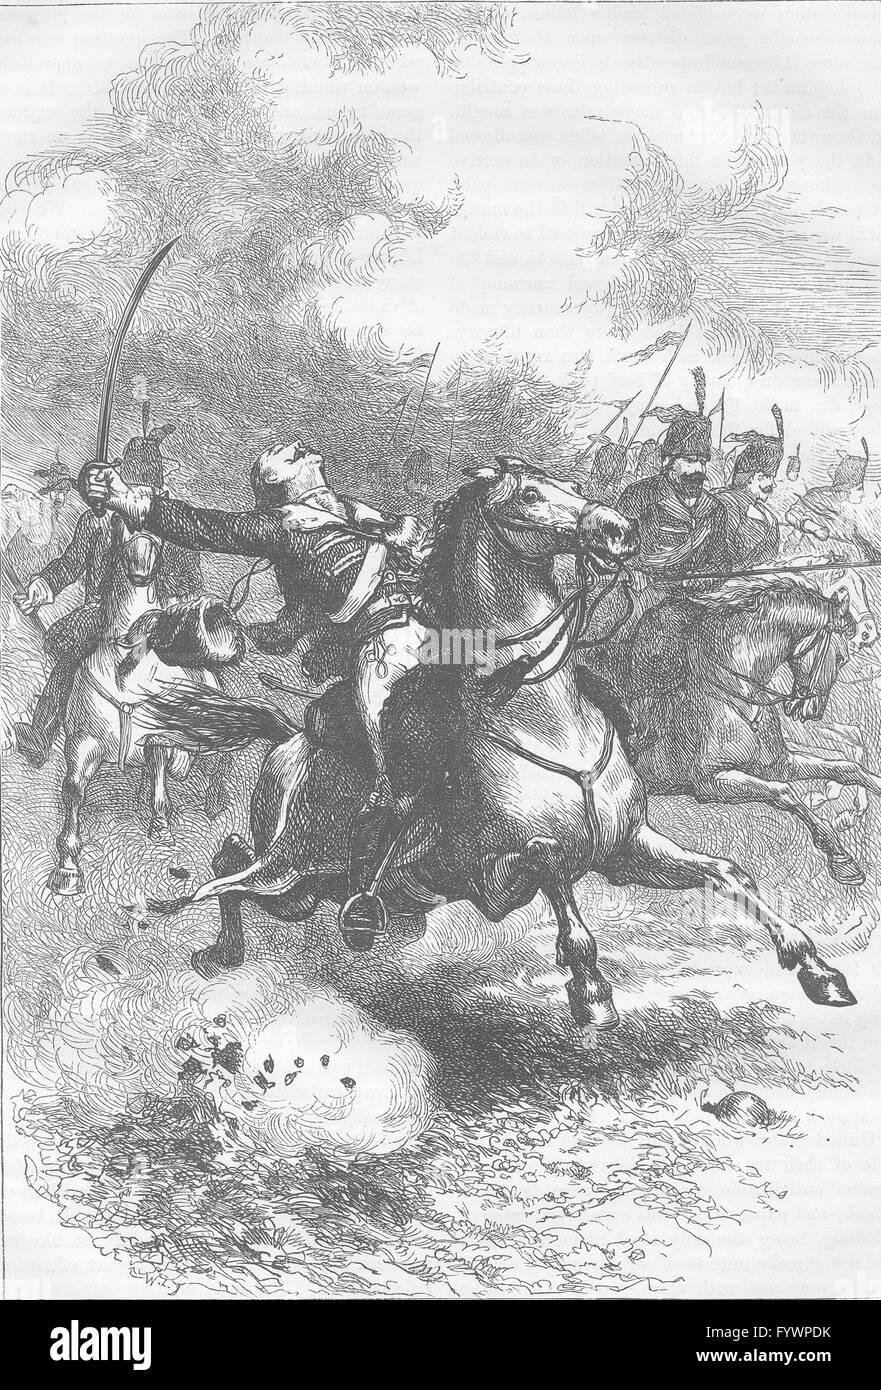 USA: The charge of Pulaski, antique print c1880 - Stock Image